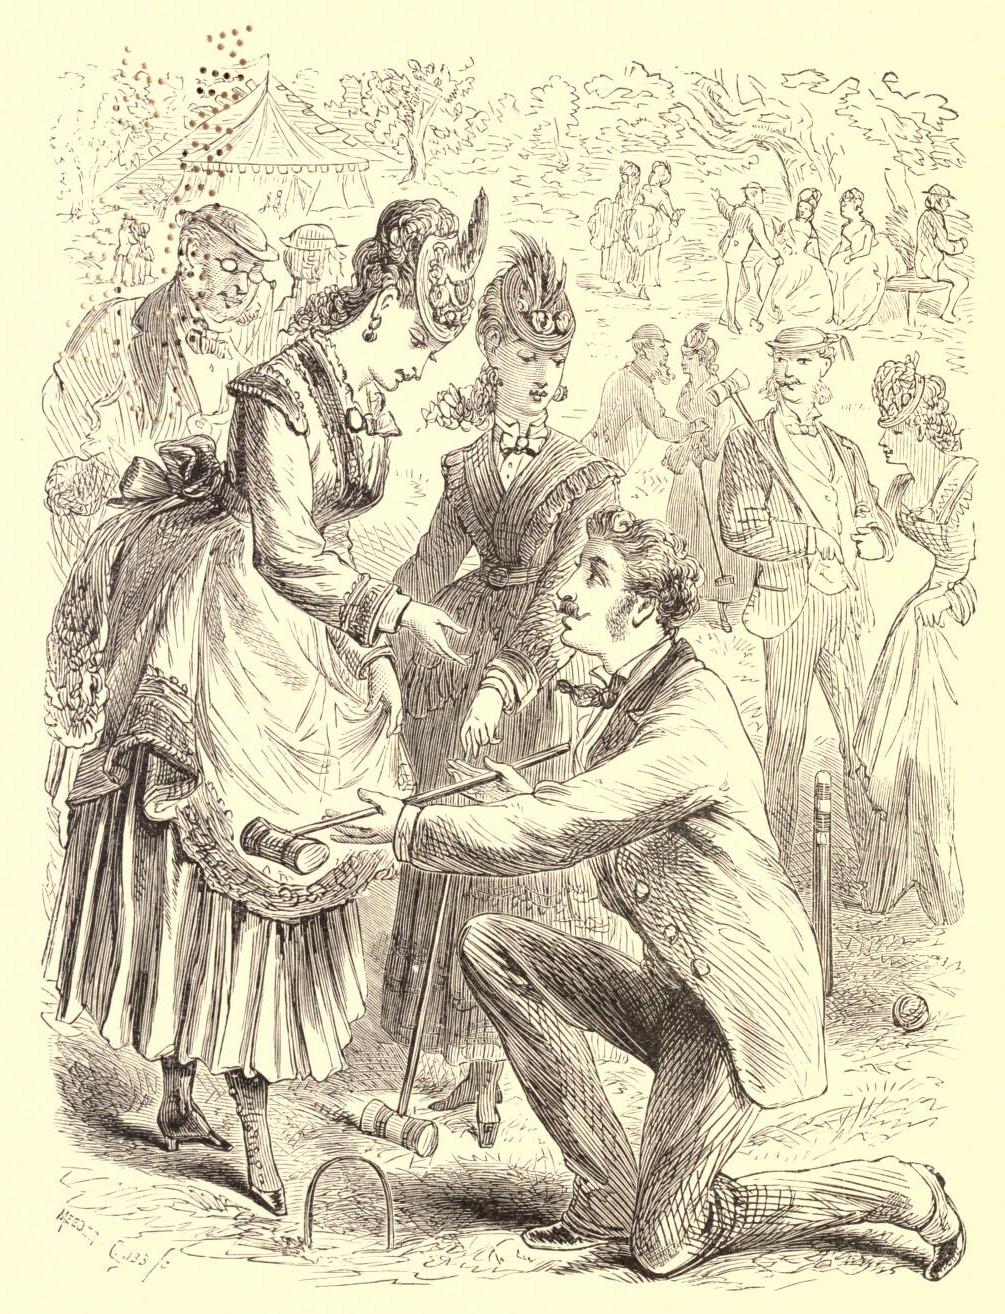 beecher-stowe-my-wife-and-i